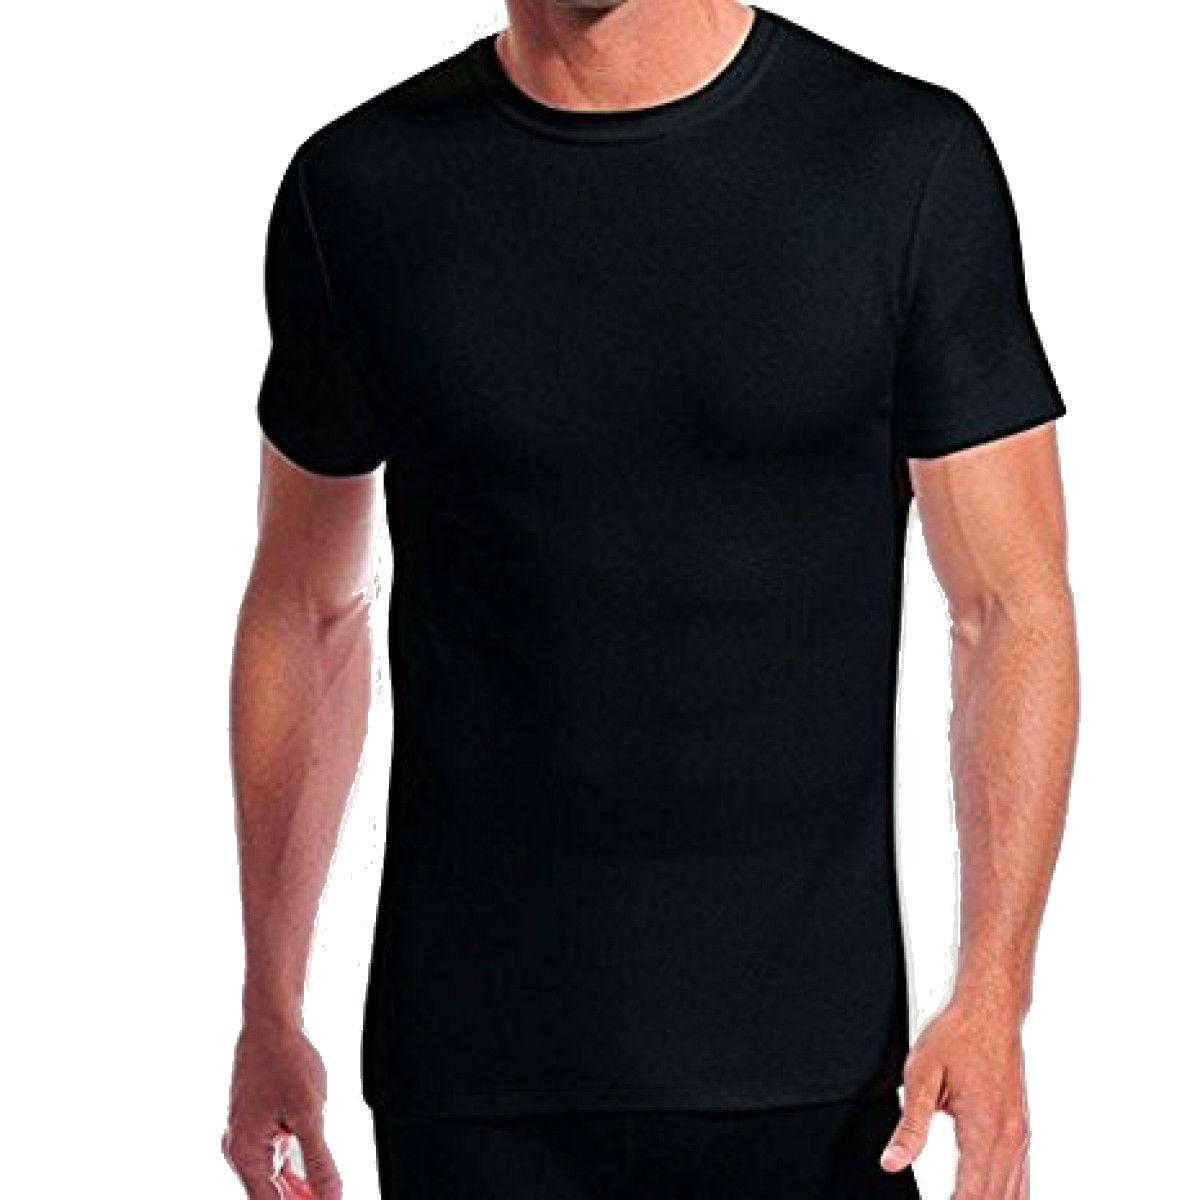 d7315113df0c -10% T-shirt ισοθερμικό Jockey thermal 15501812 - Μαύρο Ανδρικά